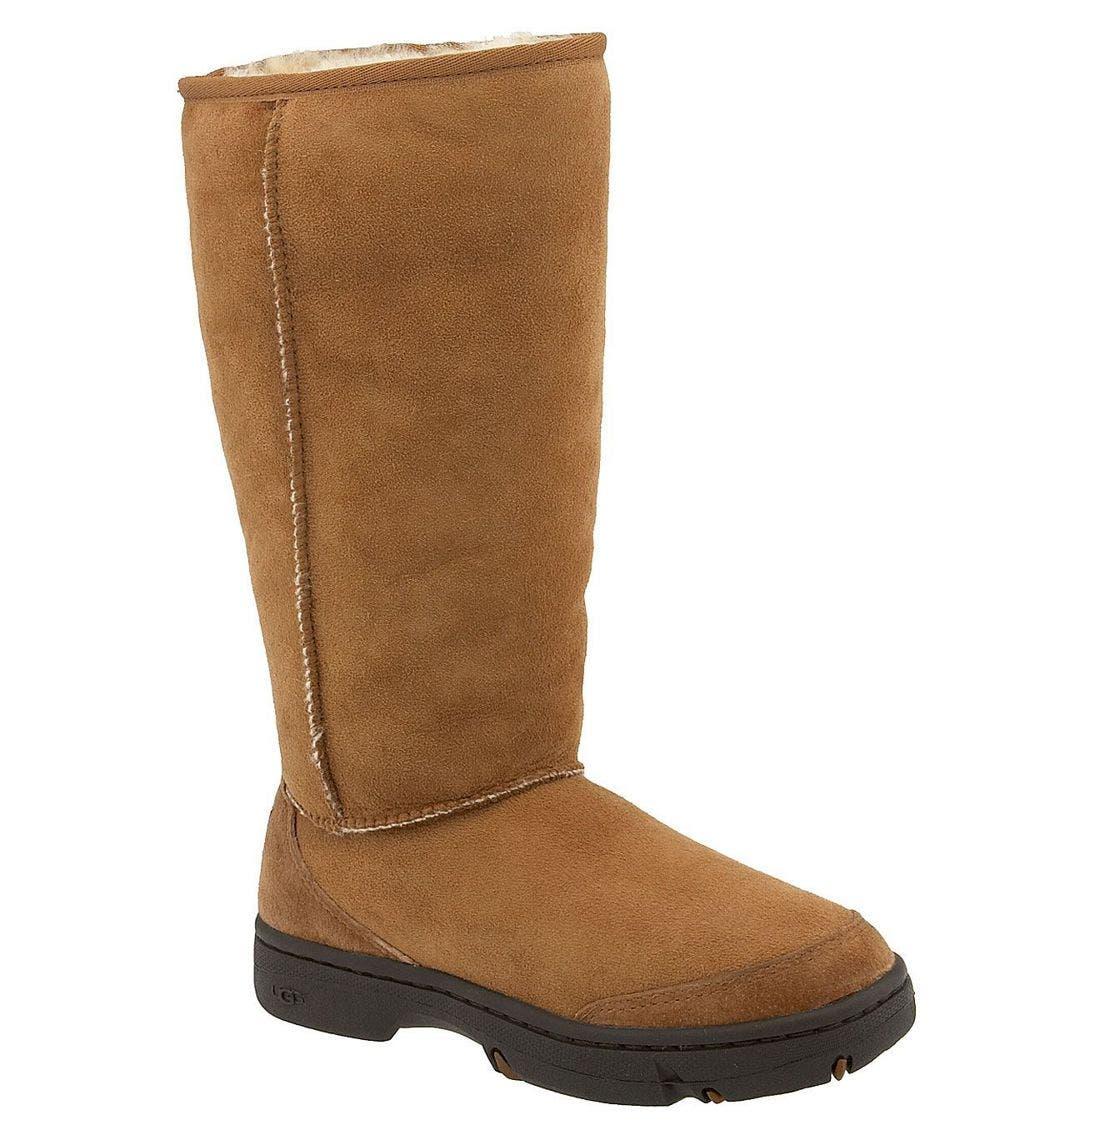 Alternate Image 1 Selected - UGG® Australia 'Ultimate Tall Braid' Boot (Women)